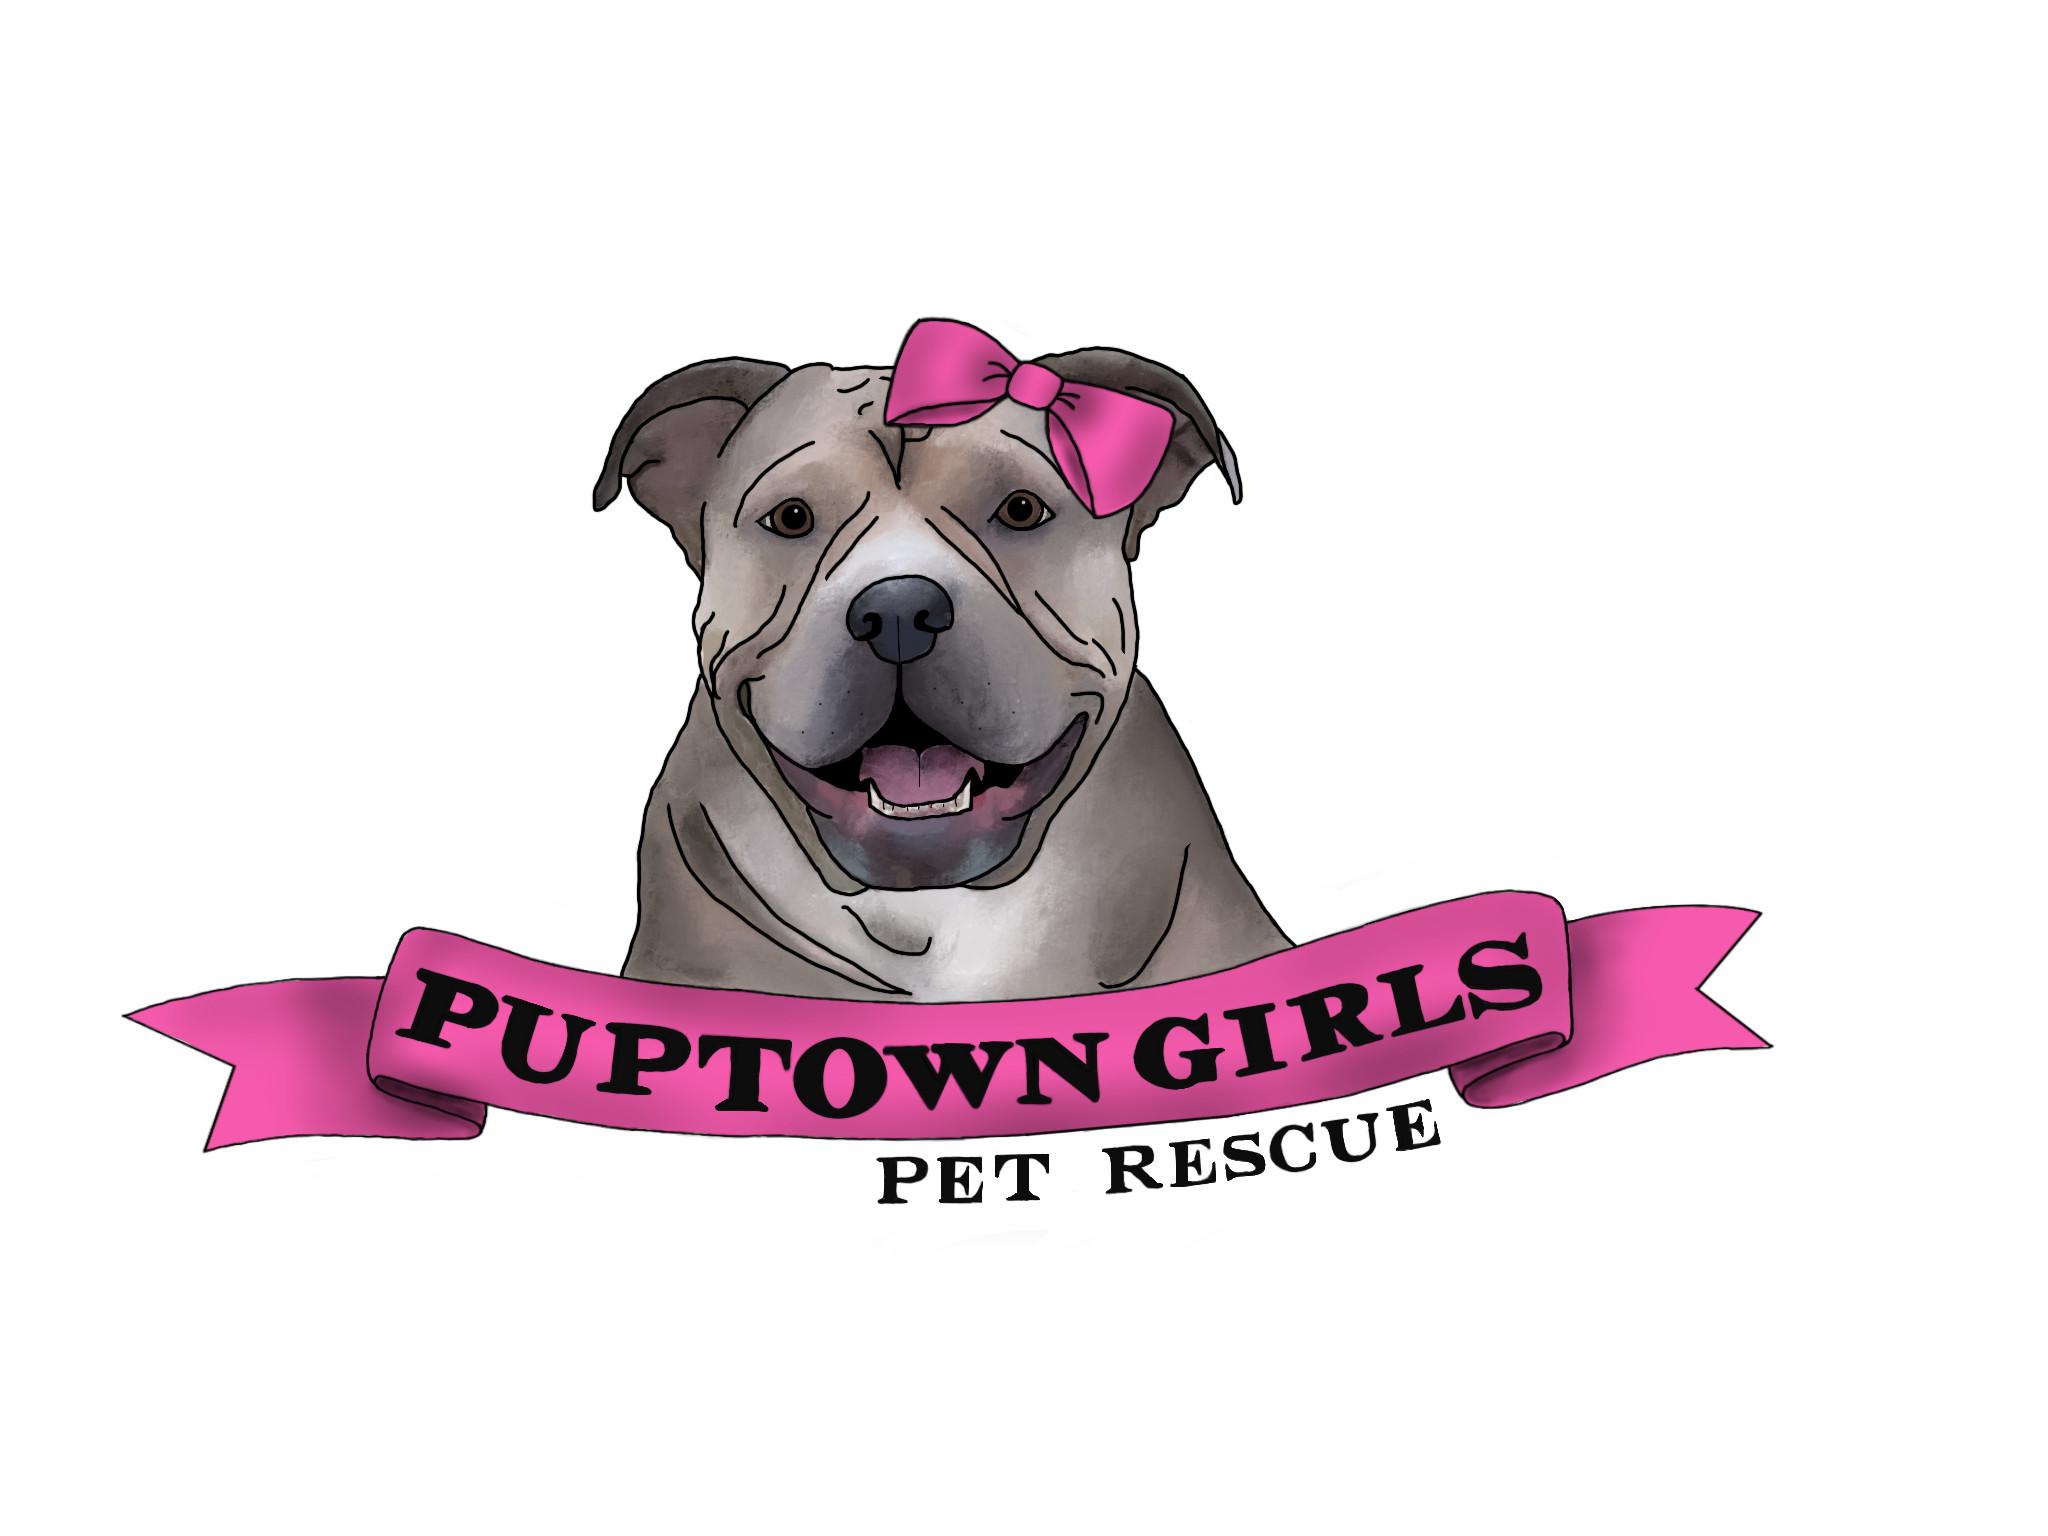 Puptown Girls Pet Rescue, Inc